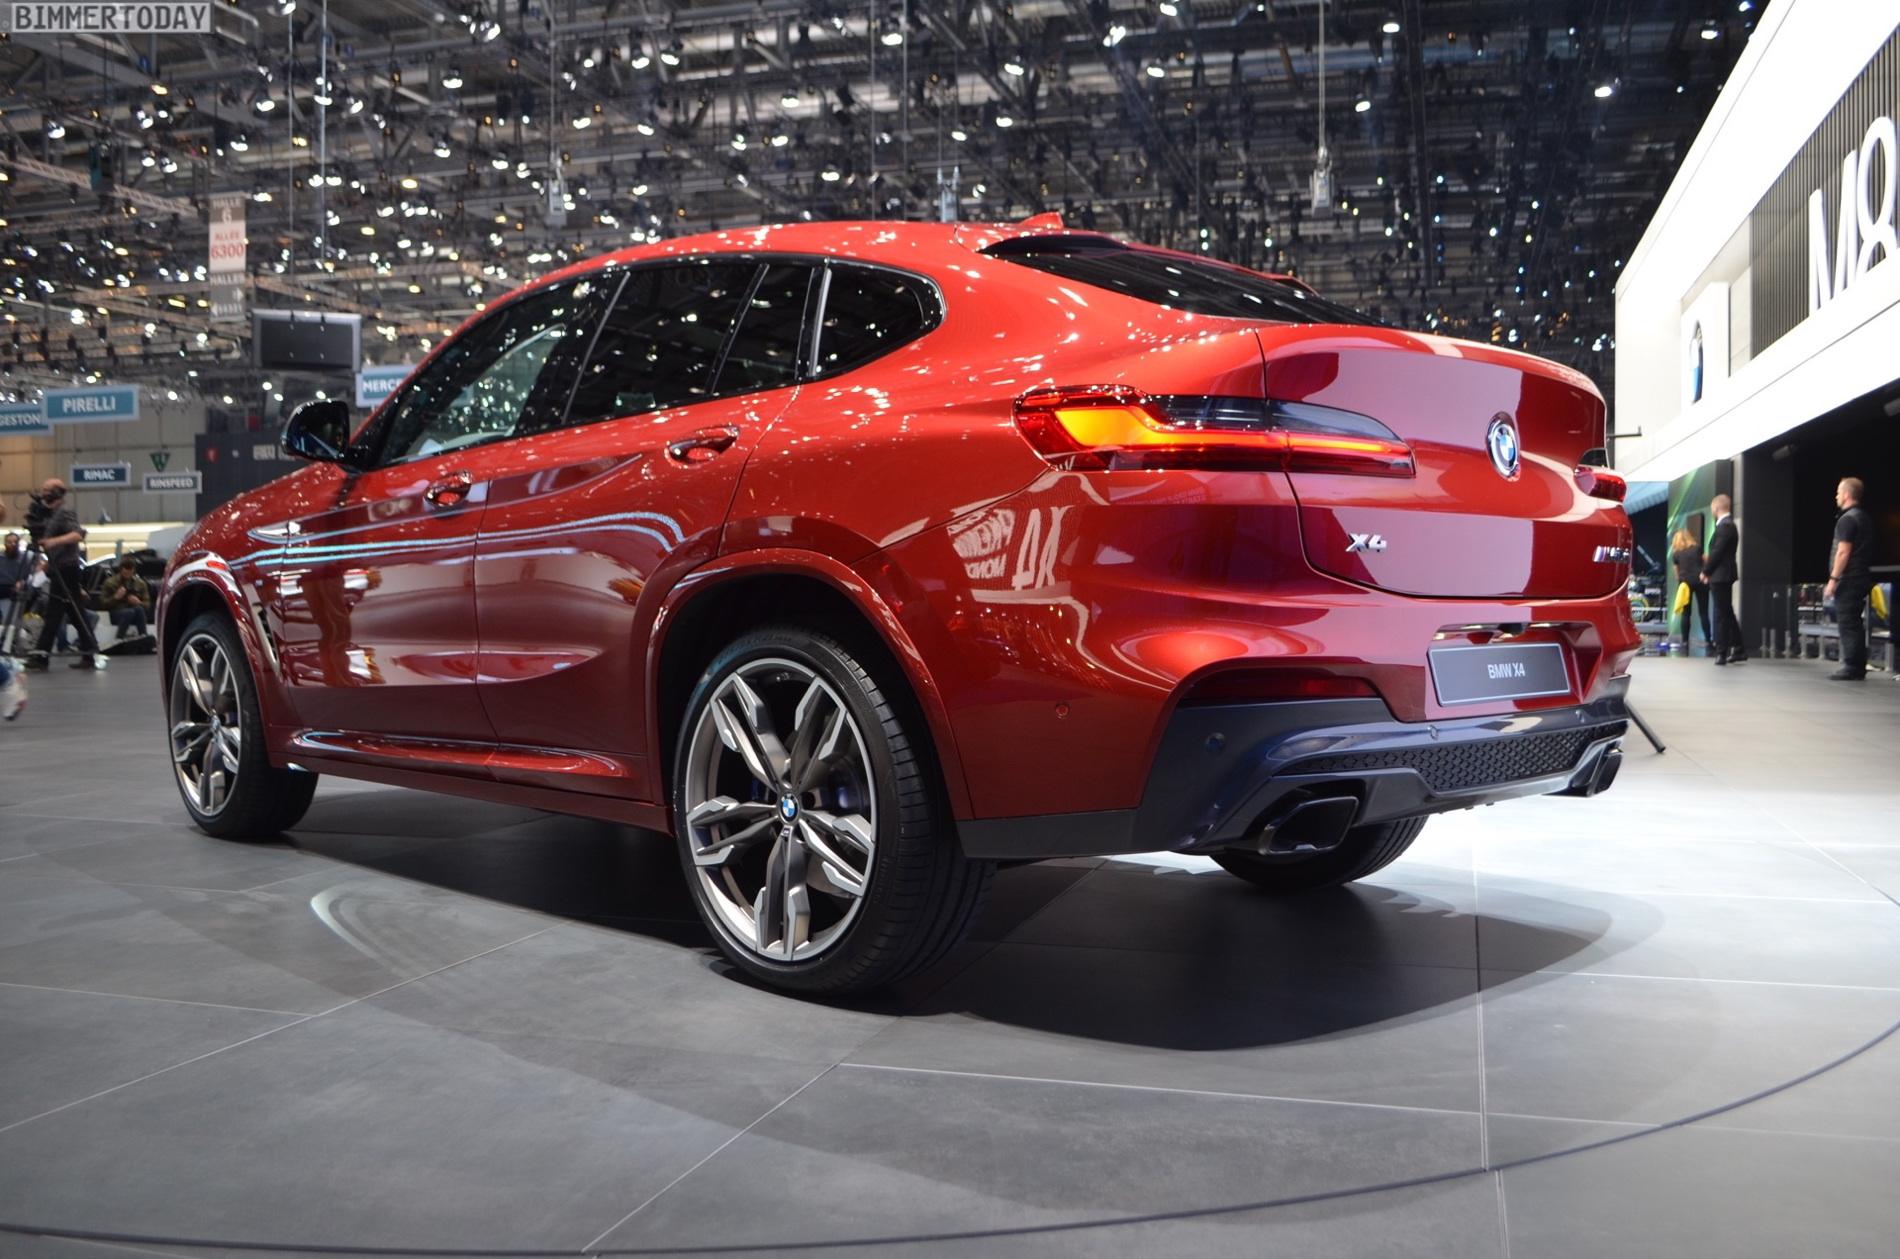 2018 Geneva Motor Show New Bmw X4 In Flamenco Red